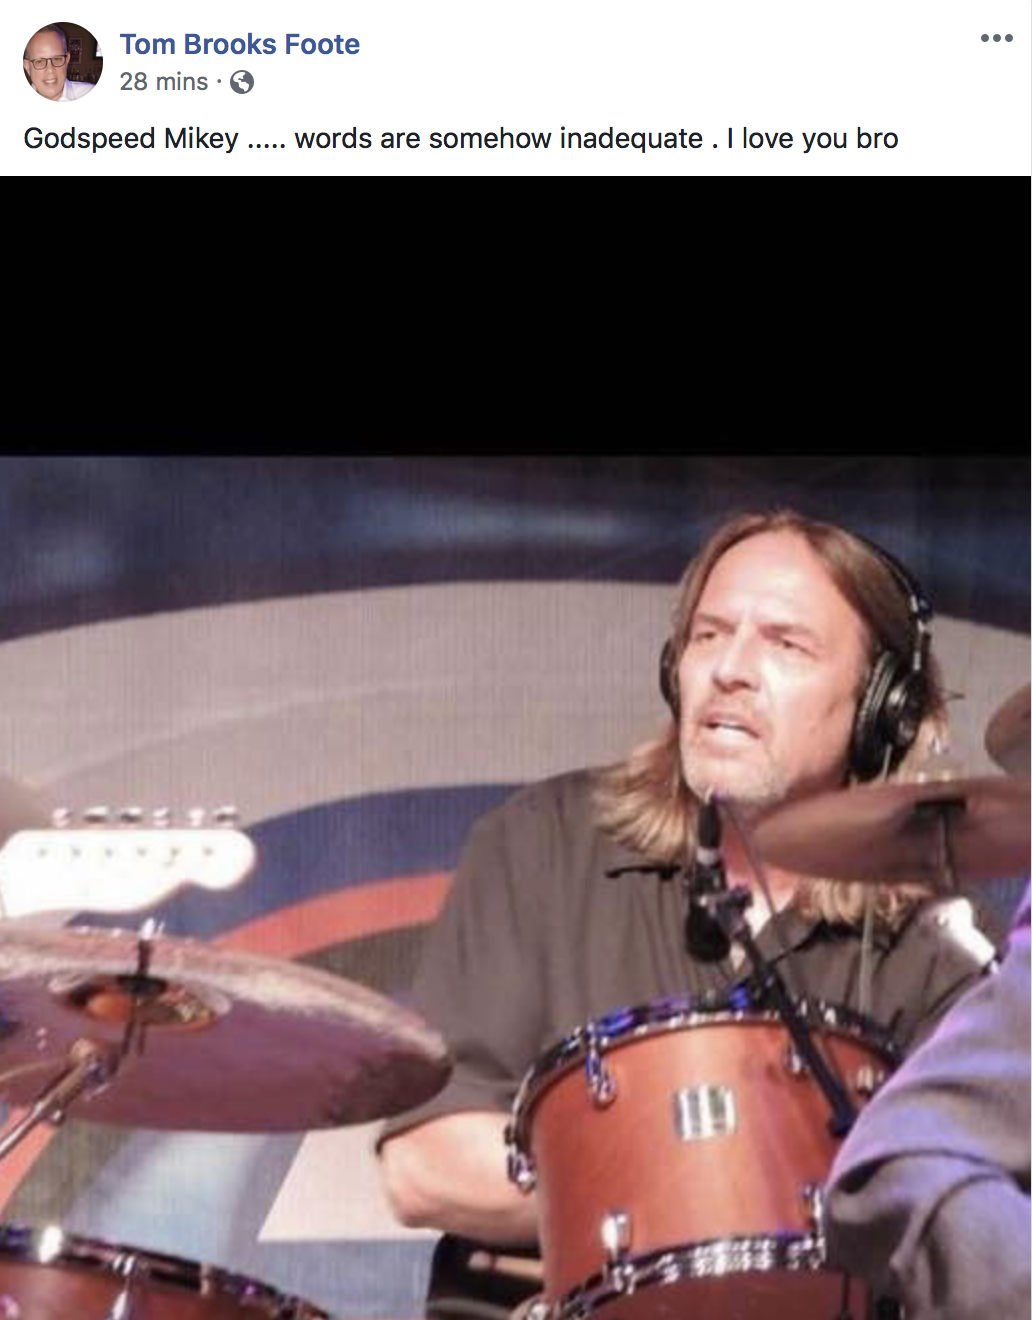 George Strait Drummer, Mike Kennedy, Killed in Car Crash